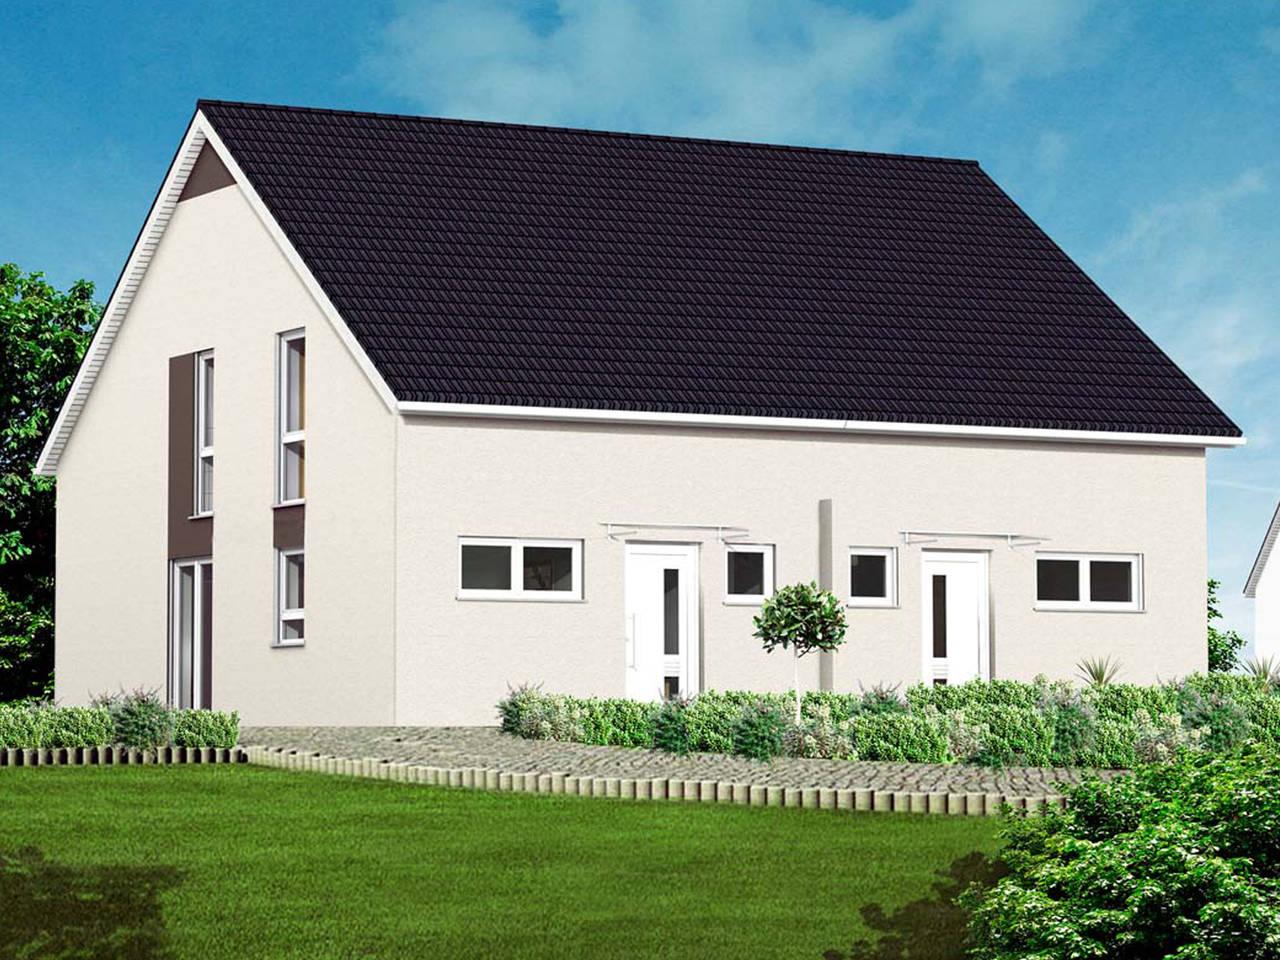 Massive Wohnbau Doppelhaus 6